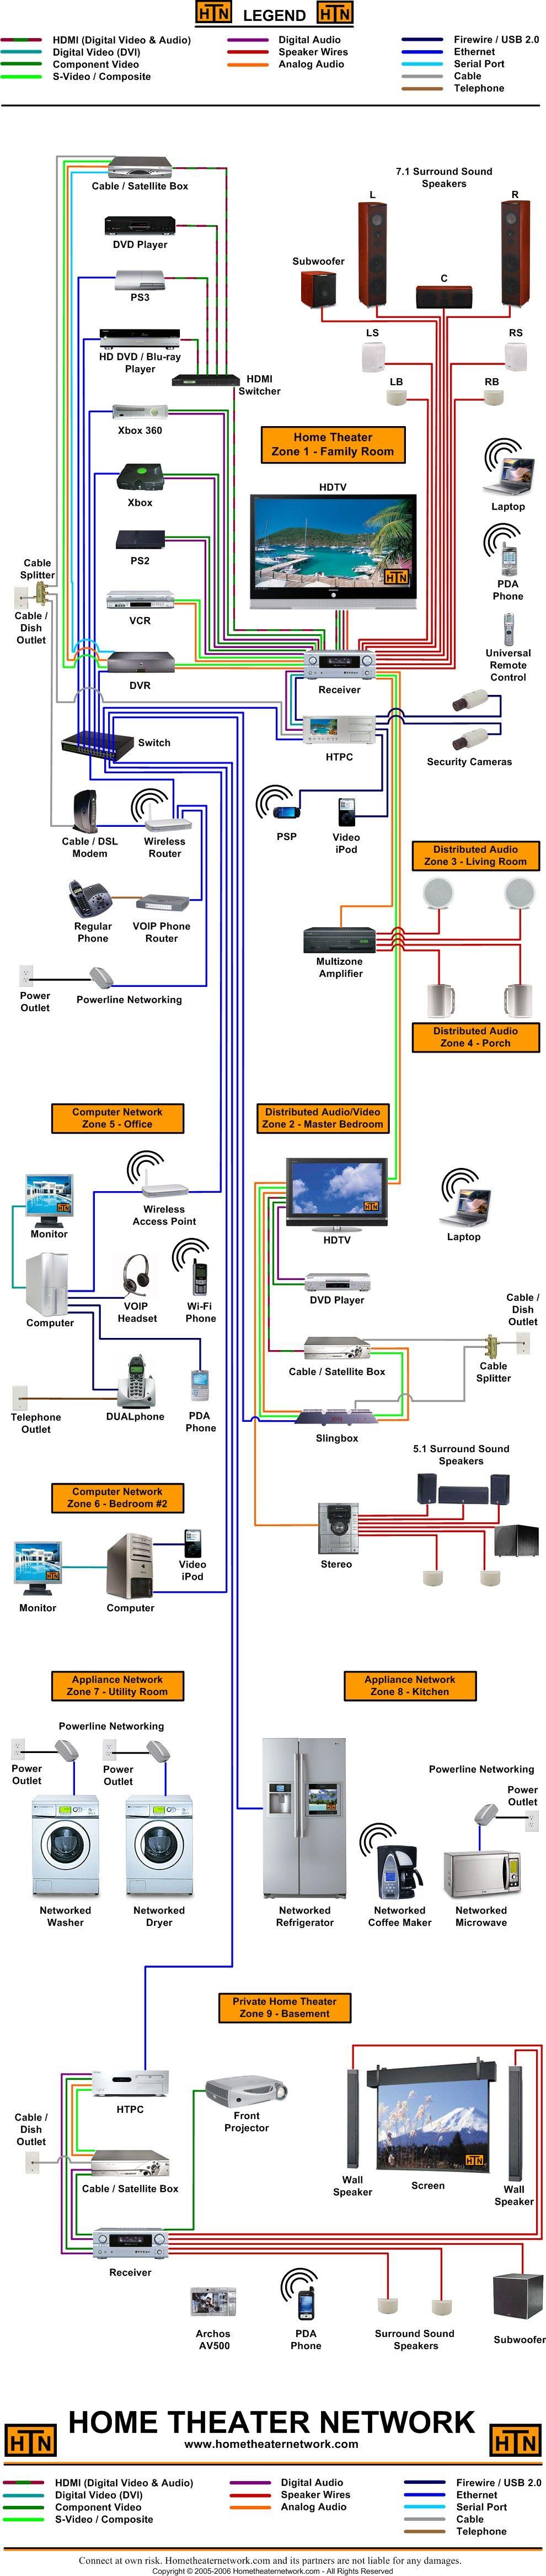 Home theater network   large block diagram also media room pinterest rh za